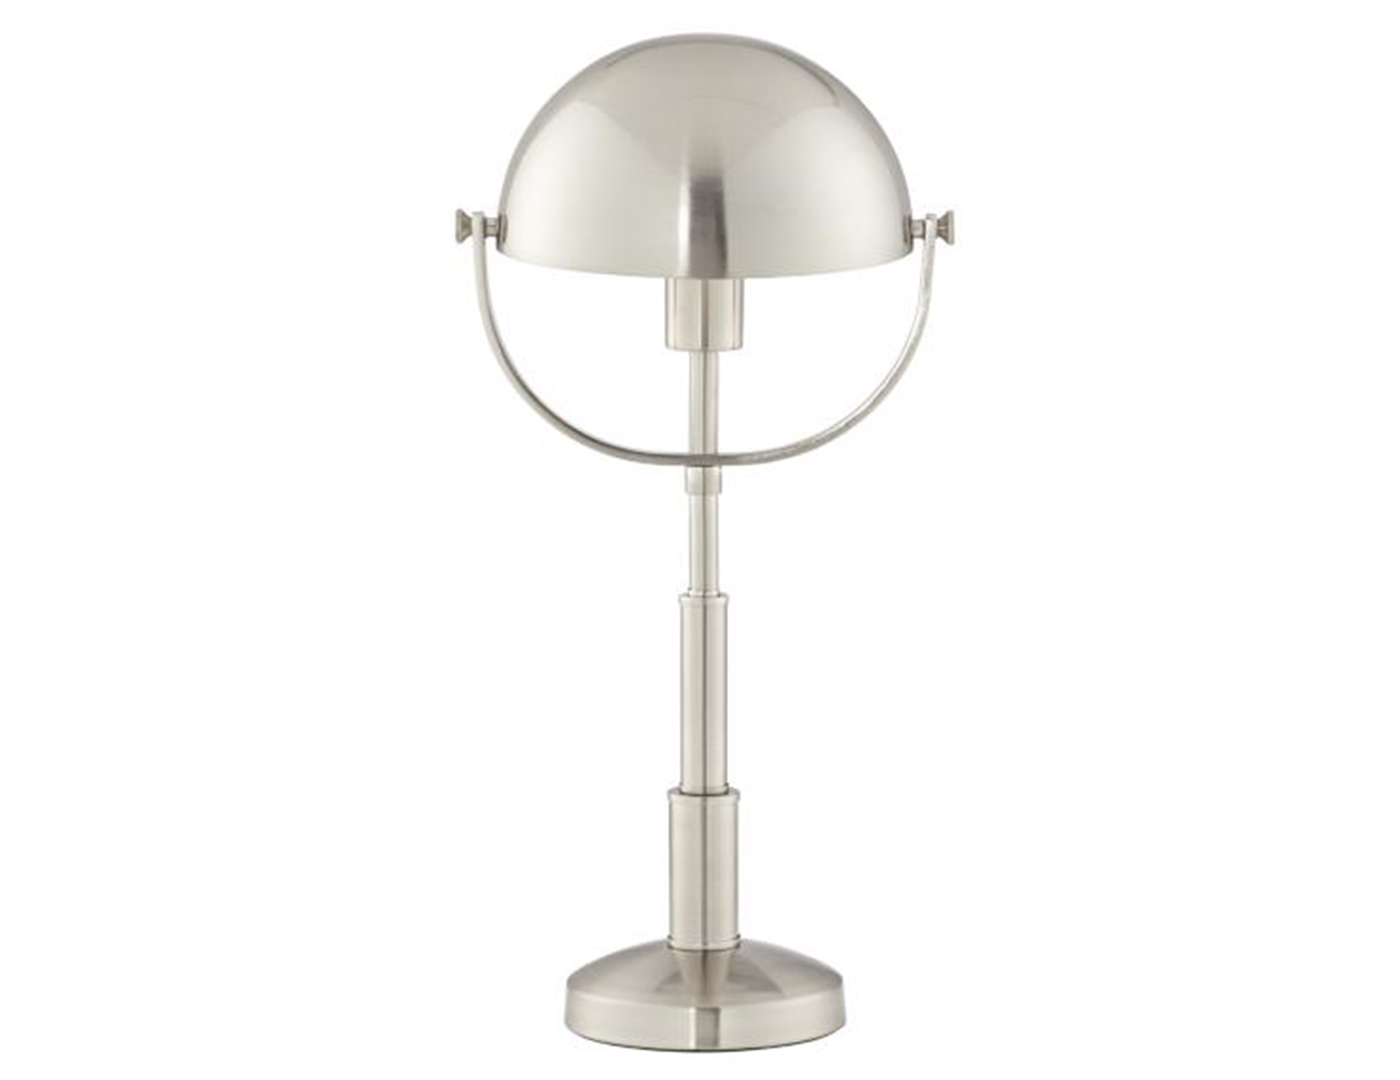 Chrome Dome Table Lamp